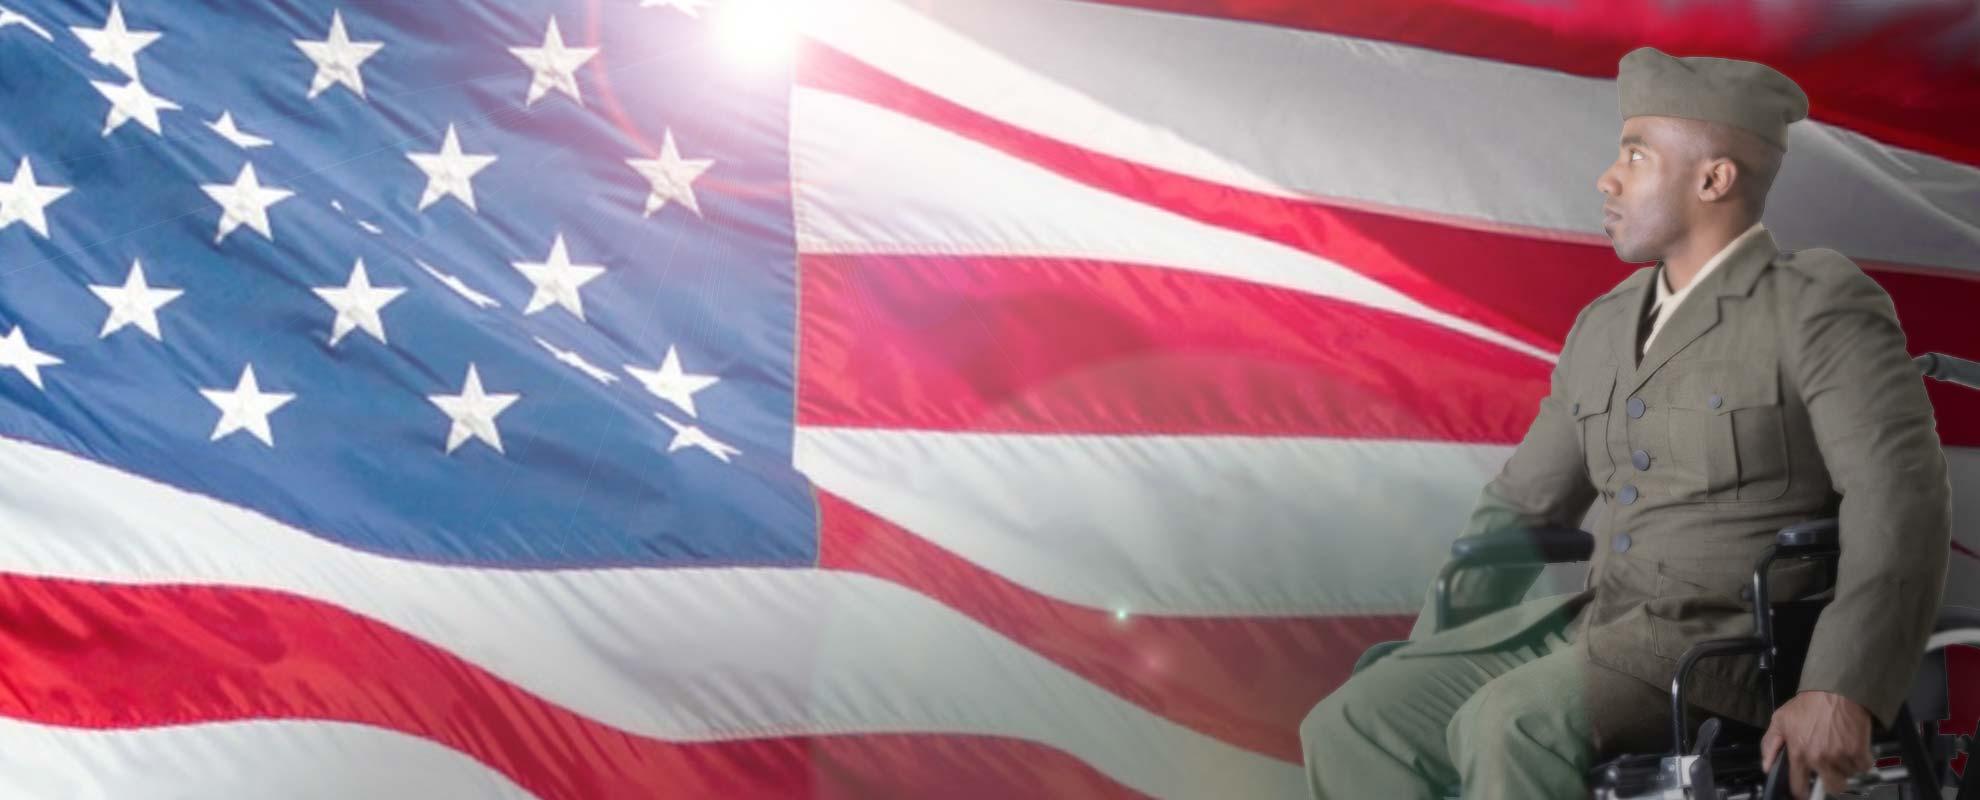 veteran flag - Military Service Medal Applications